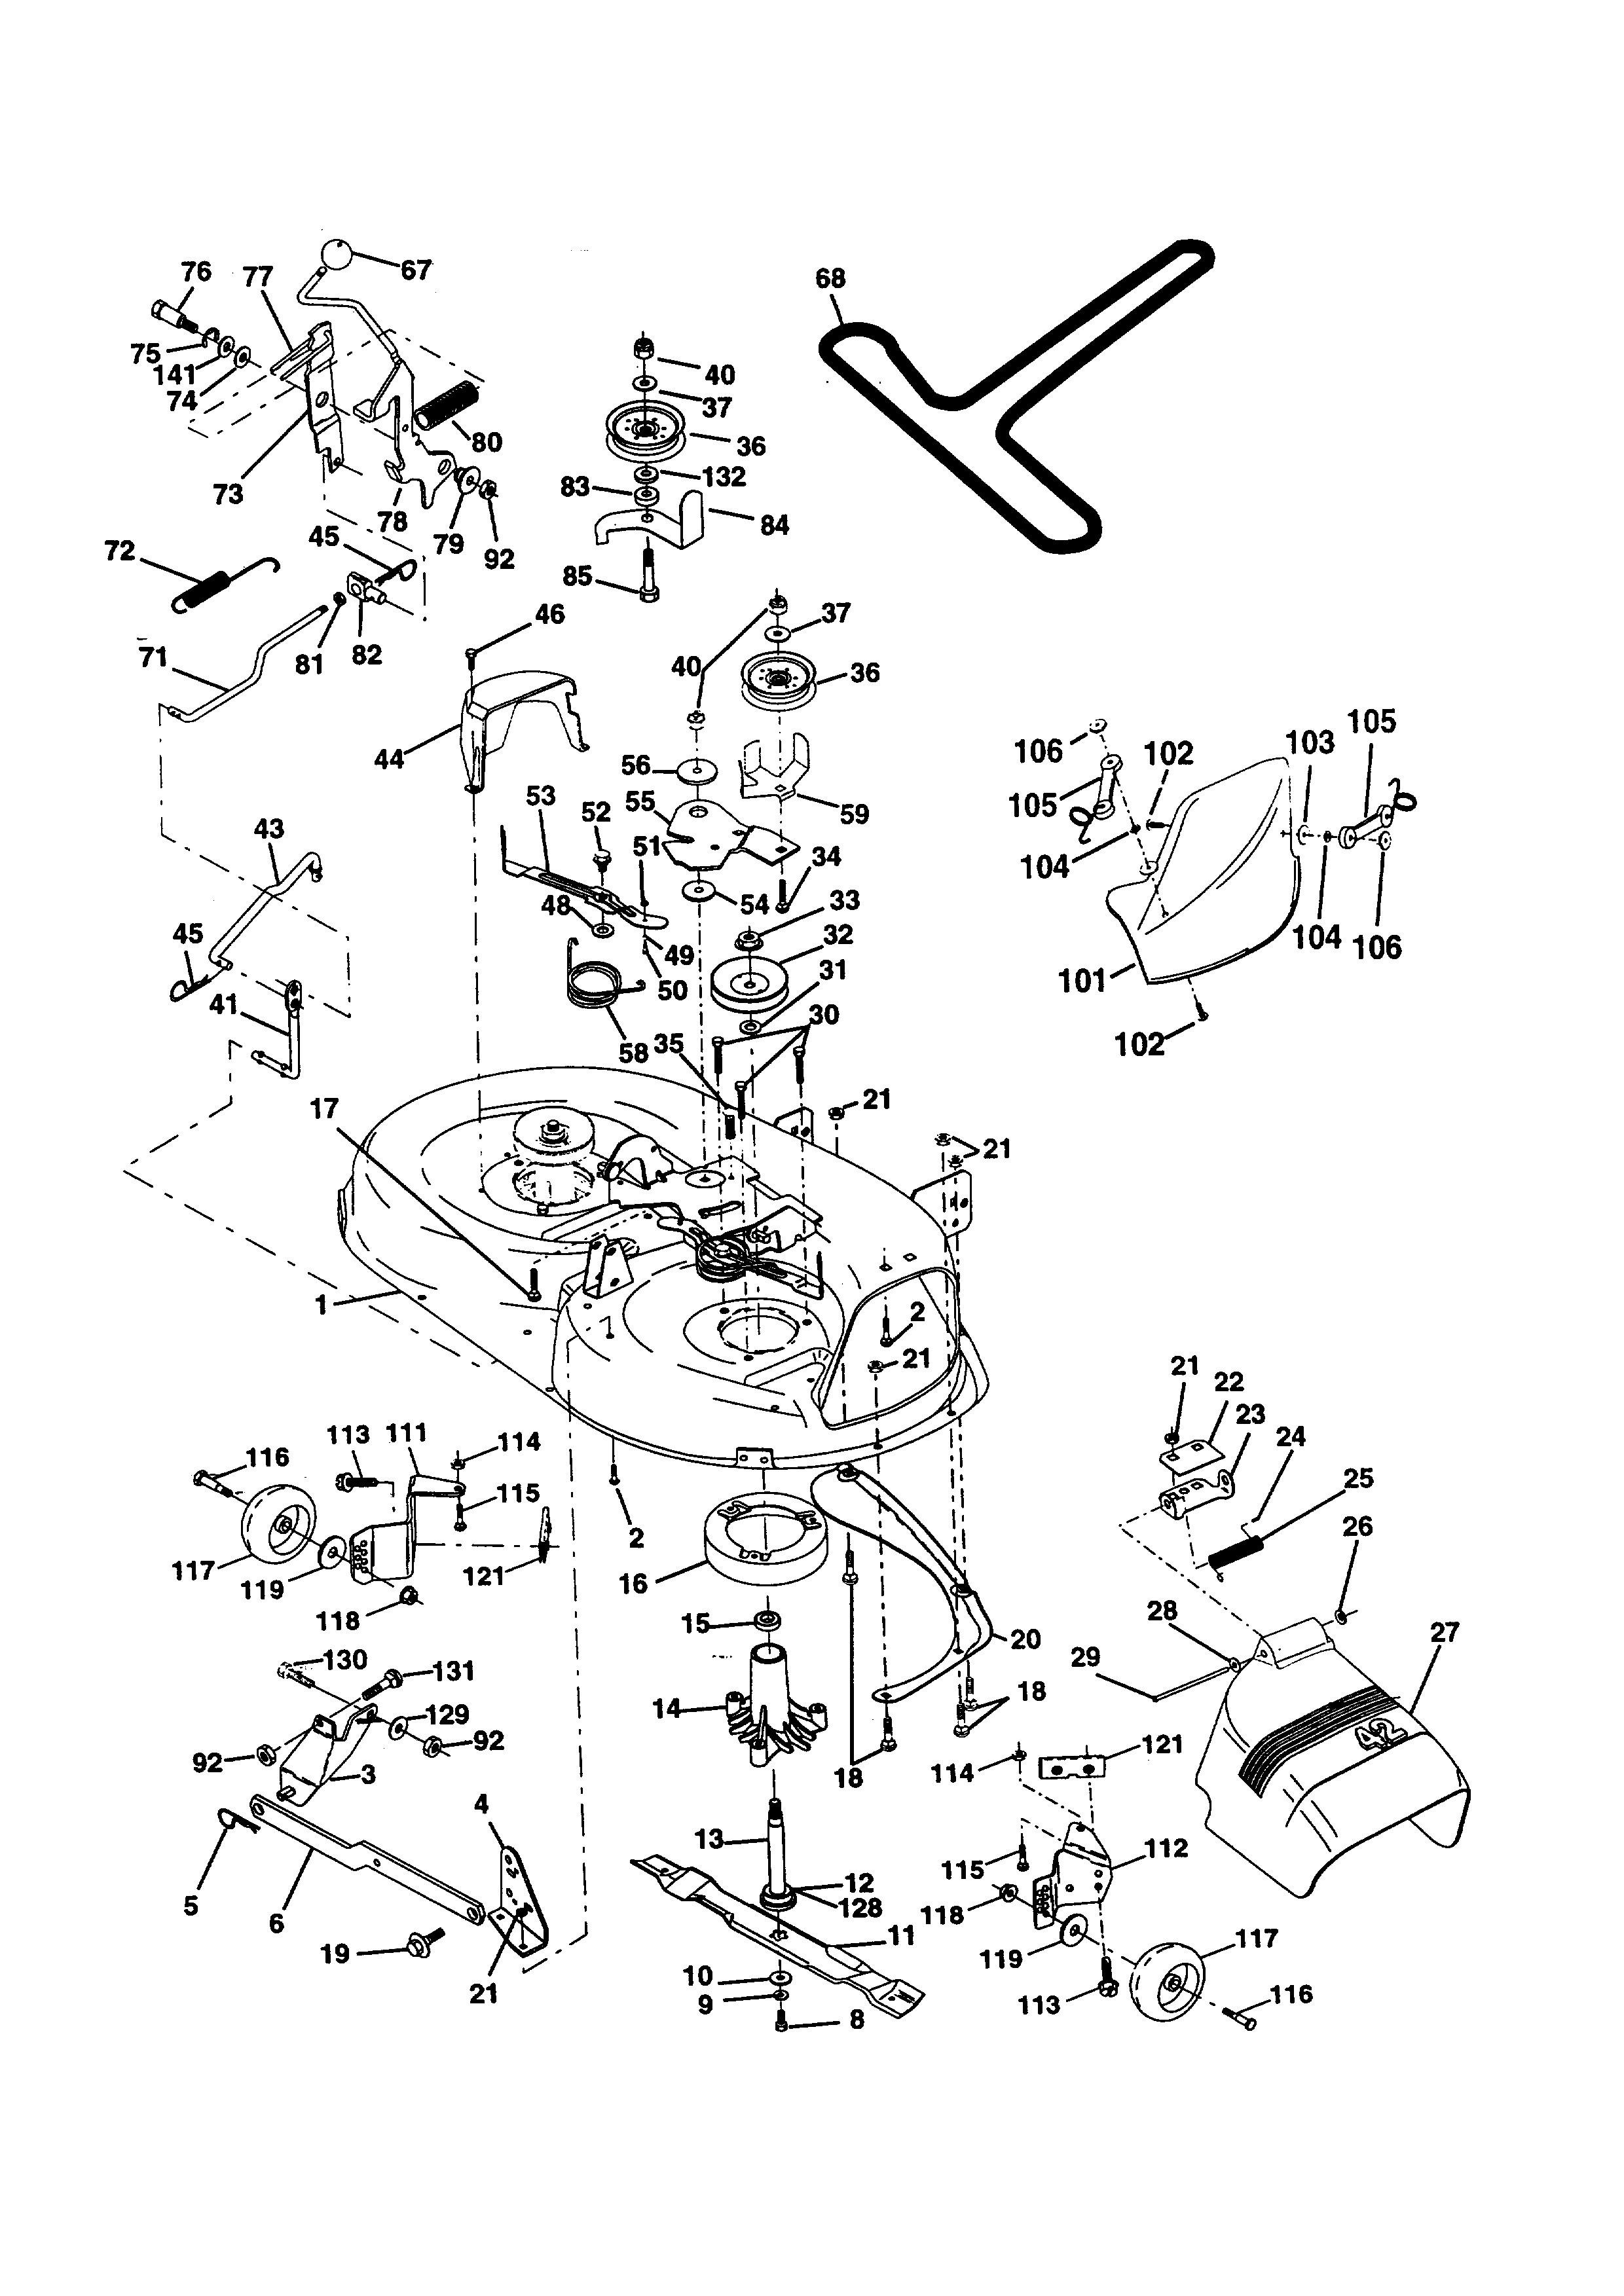 Craftsman 42 Riding Mower Parts Diagram